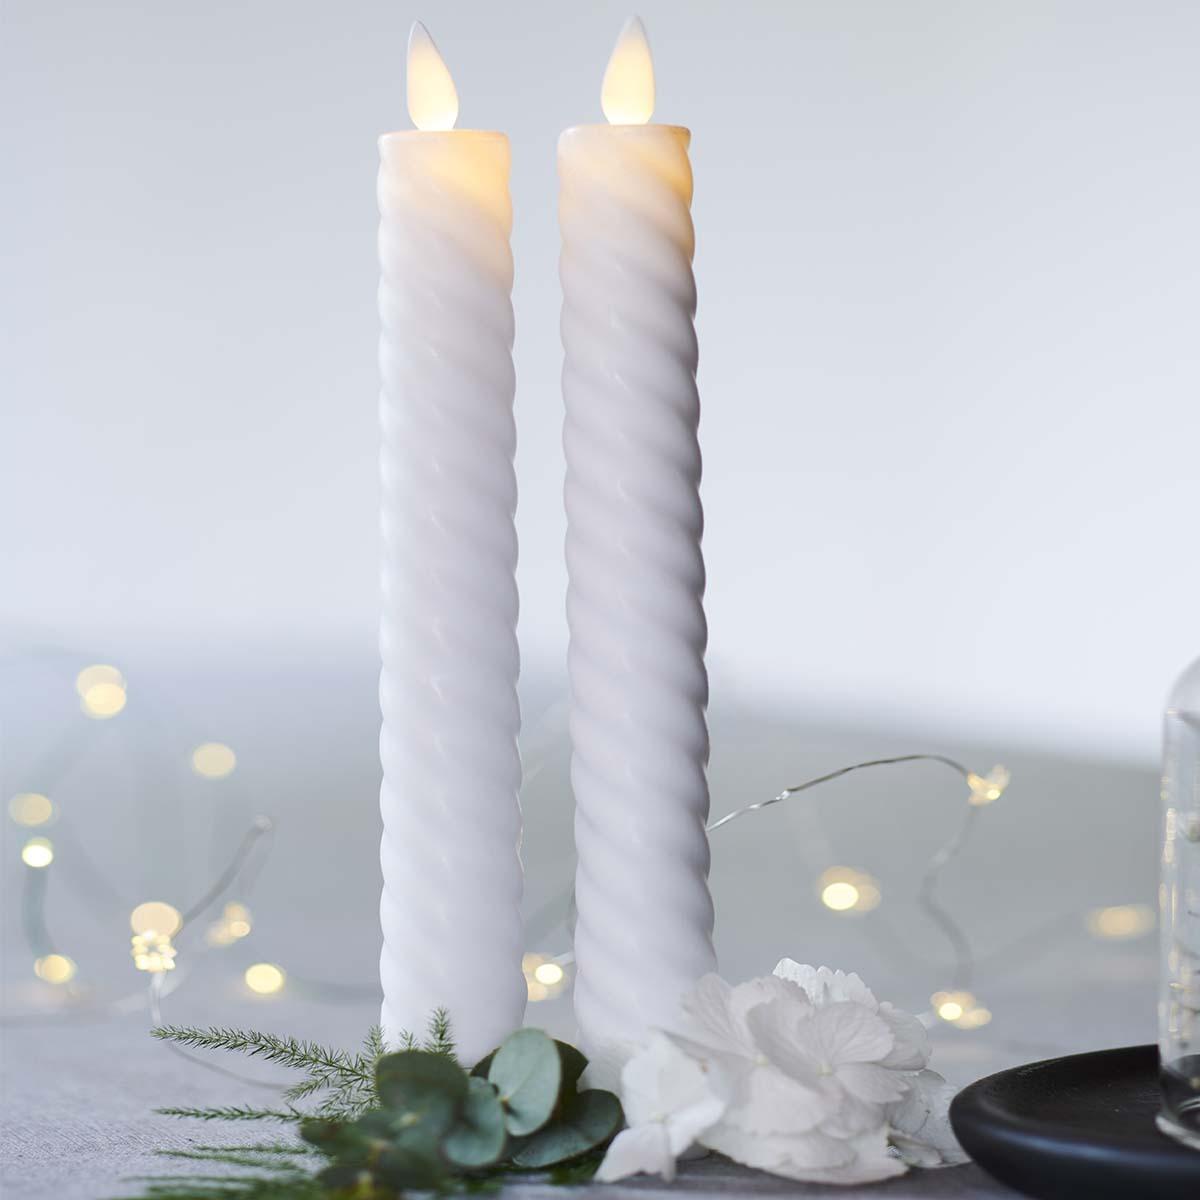 Bougies led SARA Krone blanche vraie cire flamme vacillante H 25 cm * D 2cm